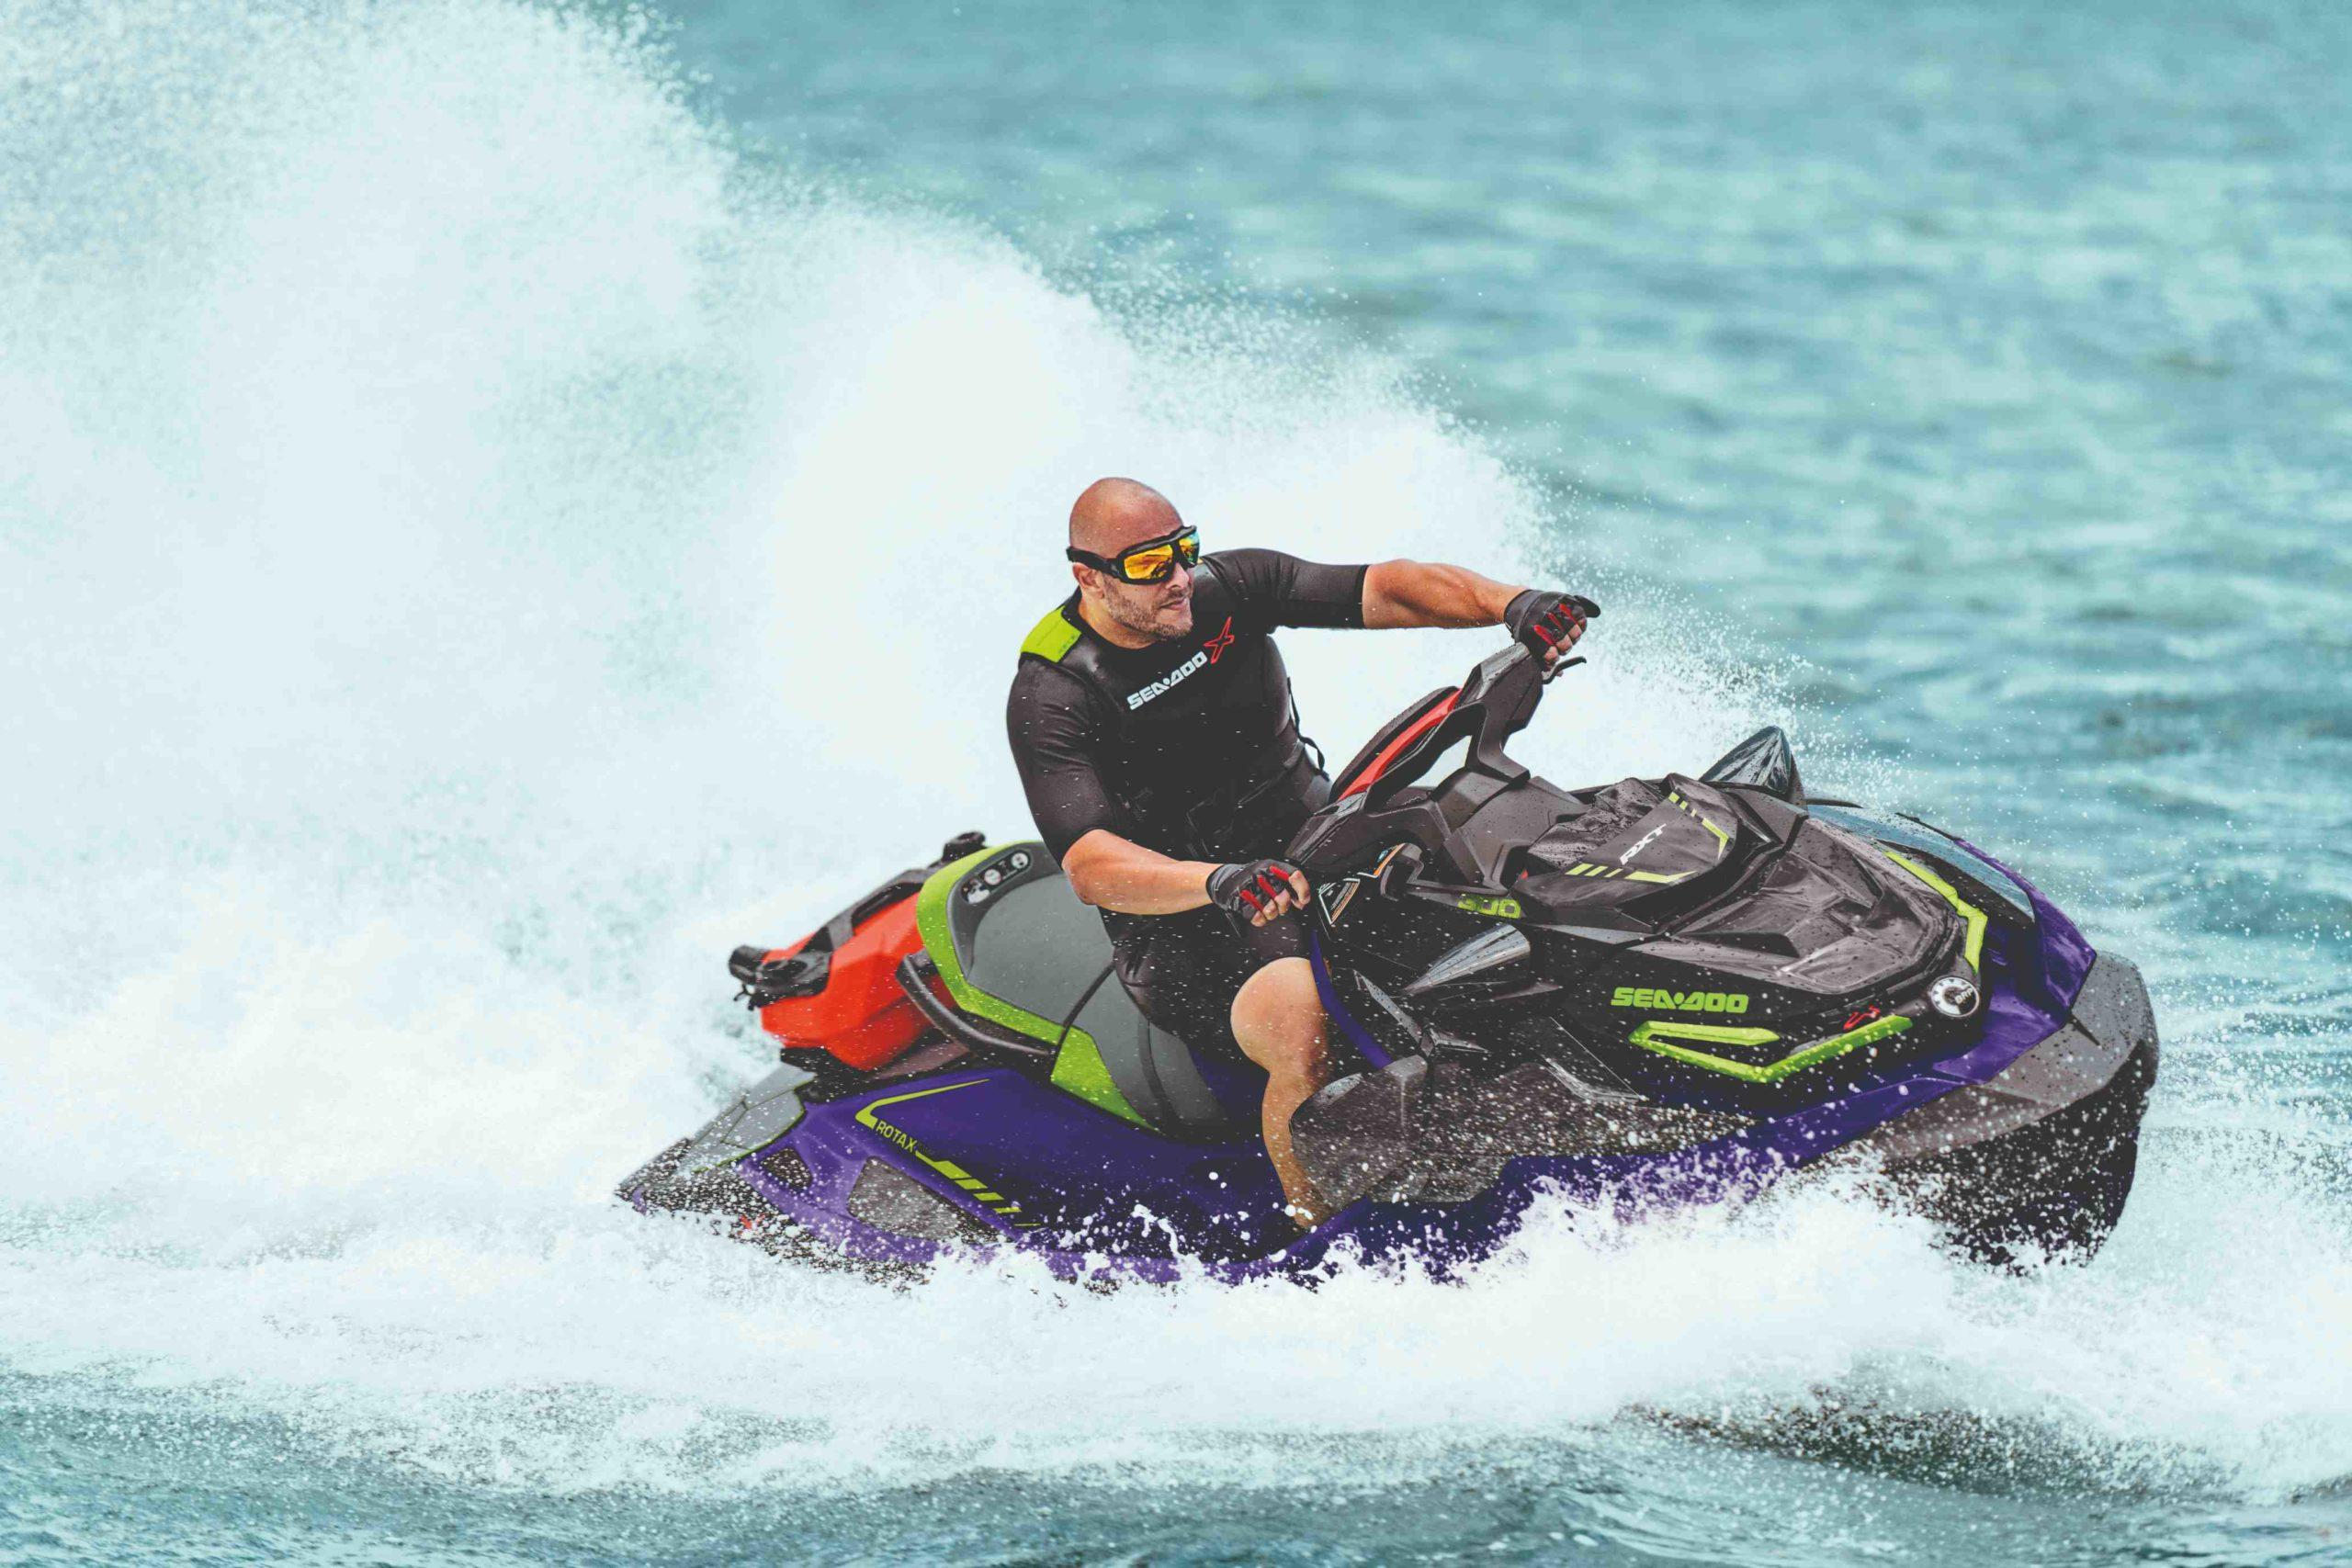 SEA-MY21-RXT-X-DB-Action-4944-R4-RGB